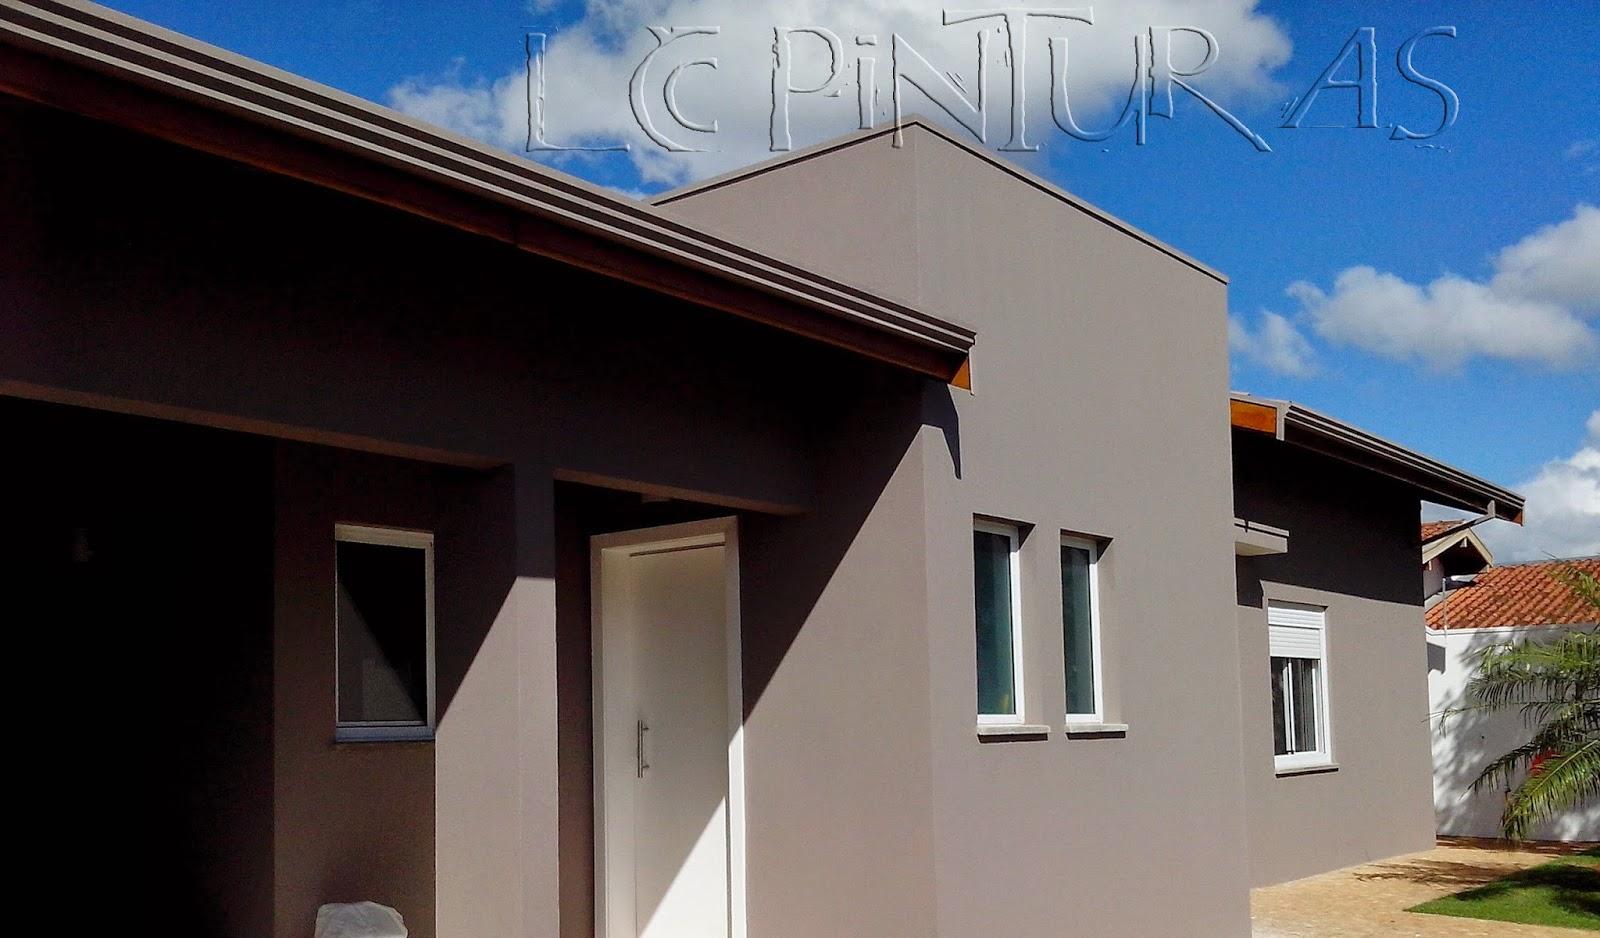 Imagens de pinturas de casas pinturas para casas pinturas for Como elegir pintura para casa